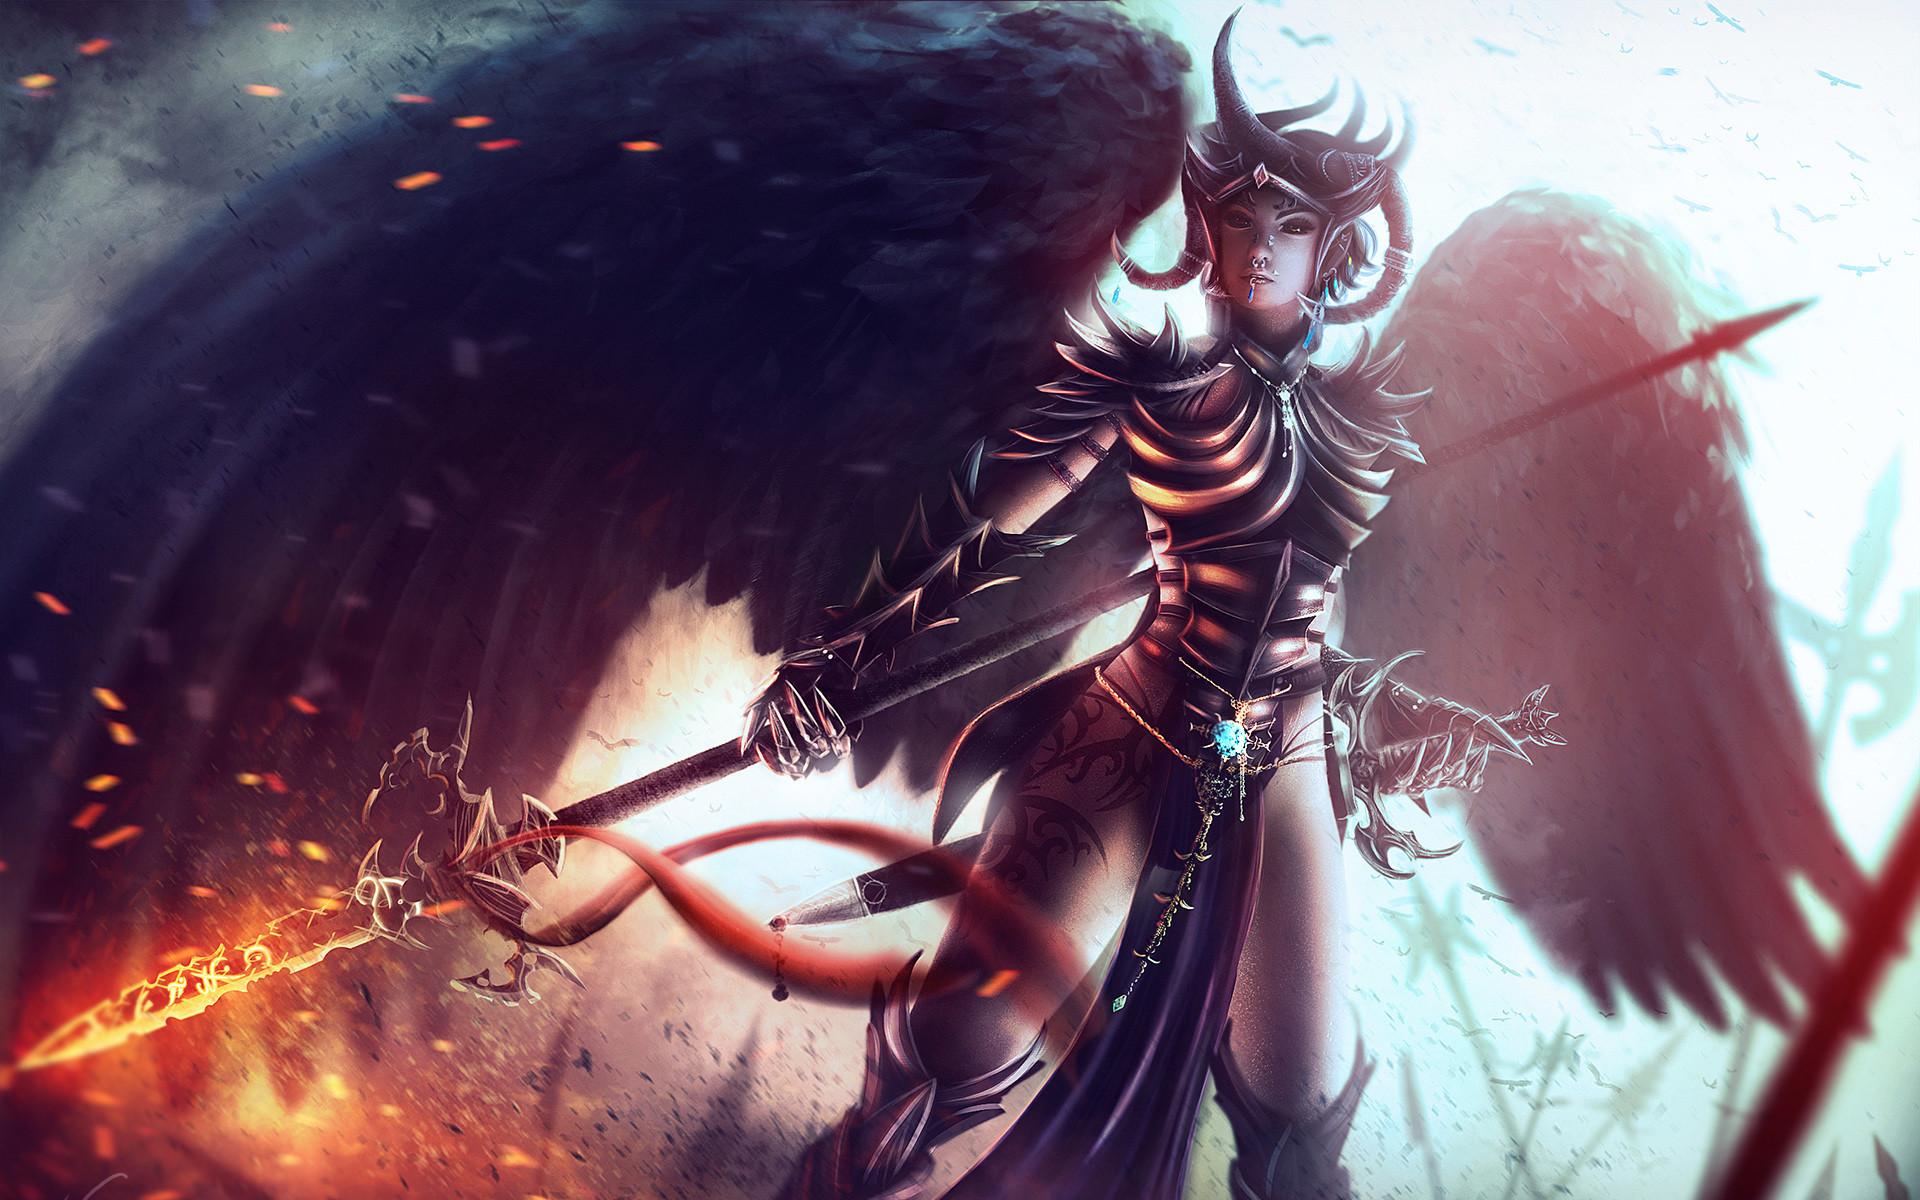 Anime Girl Angel Wallpaper | HD Desktop Wallpapers | Pinterest | Angel  wallpaper